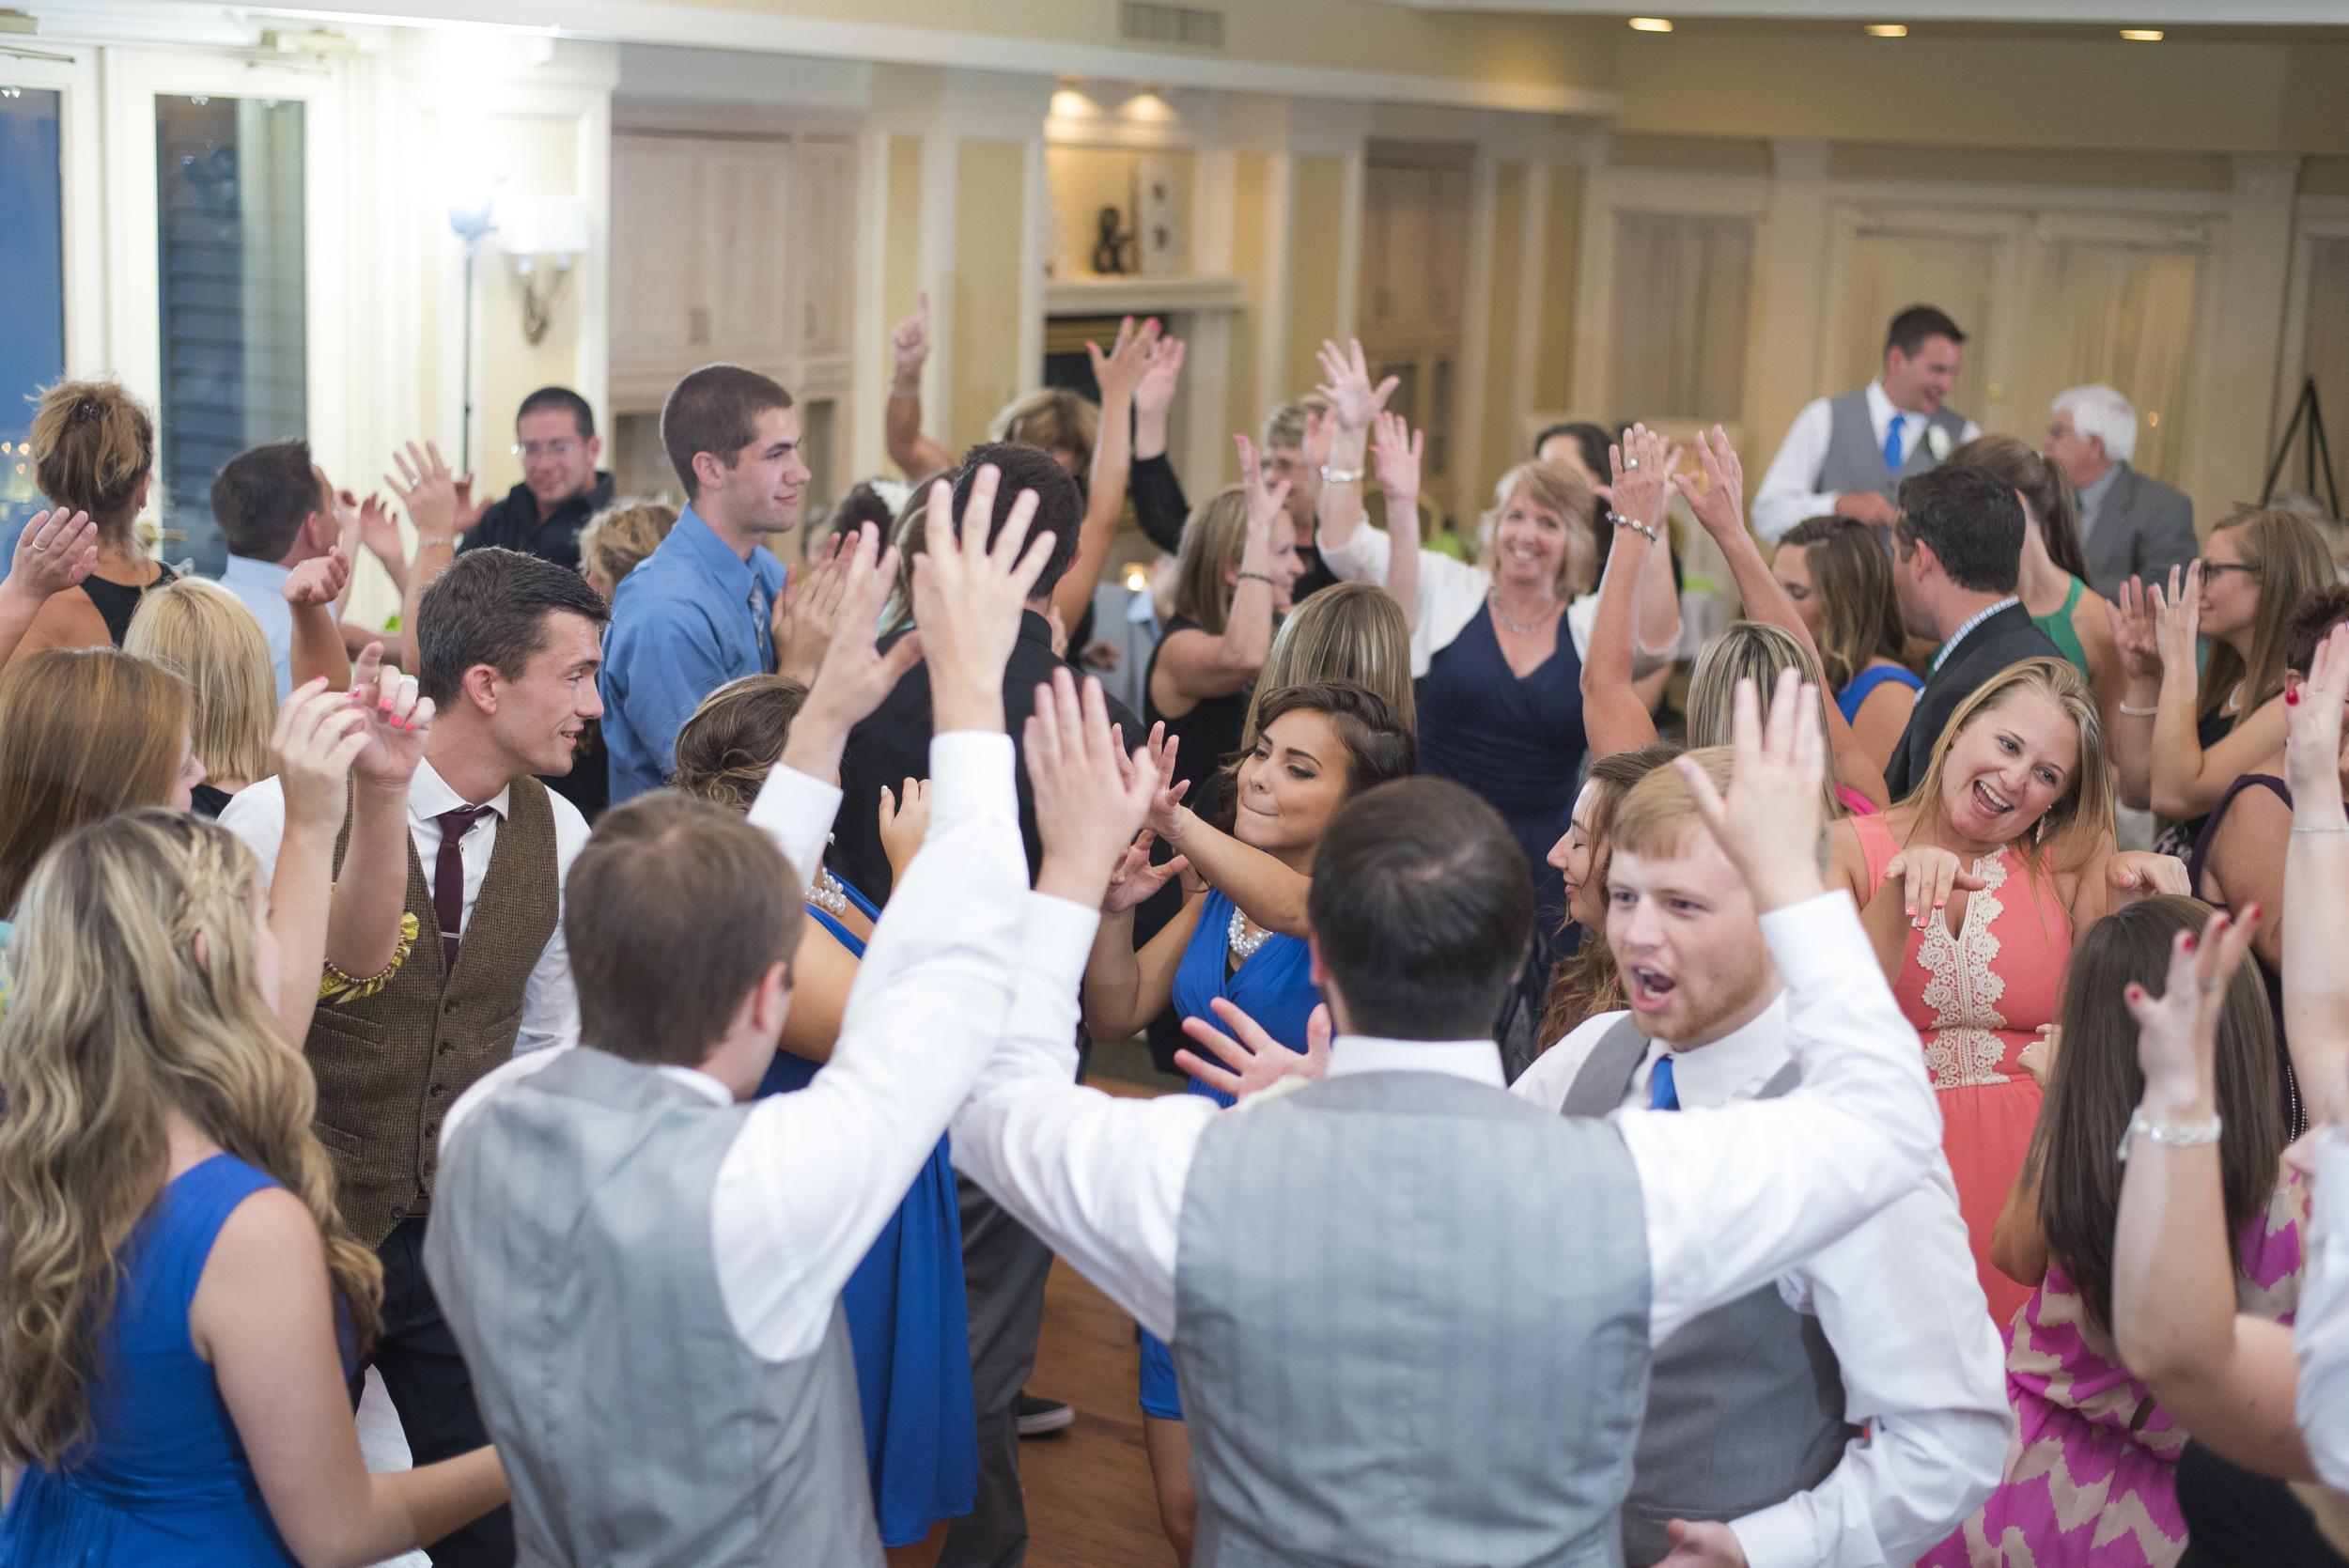 New_jersey_blue_heron_pines_wedding20150529_0605.jpg